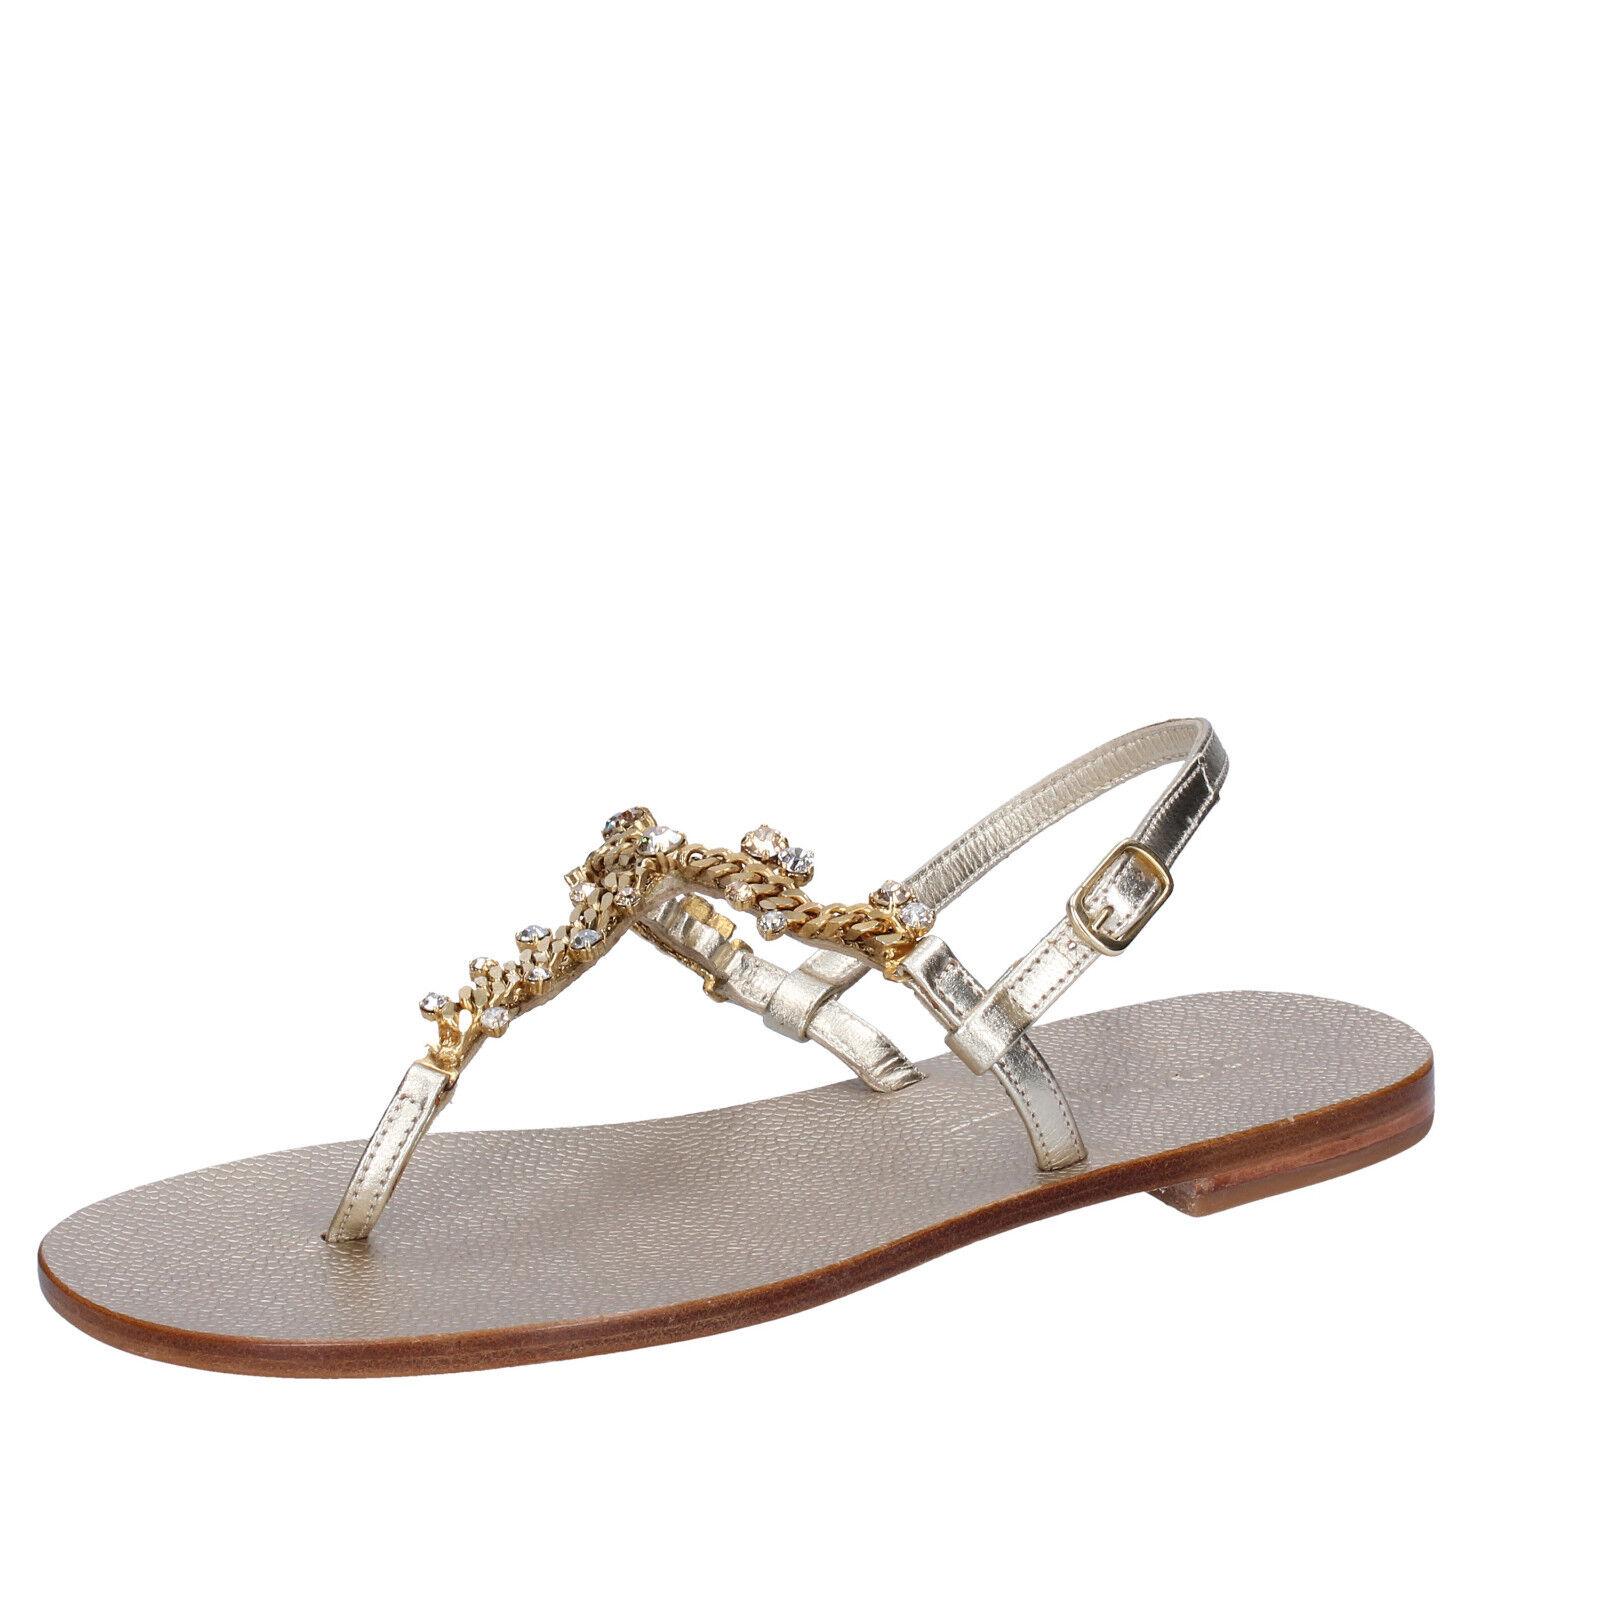 Damens's schuhe EDDY DANIELE 7 (EU 37) Sandale platinum Leder Swarovski AW67-37